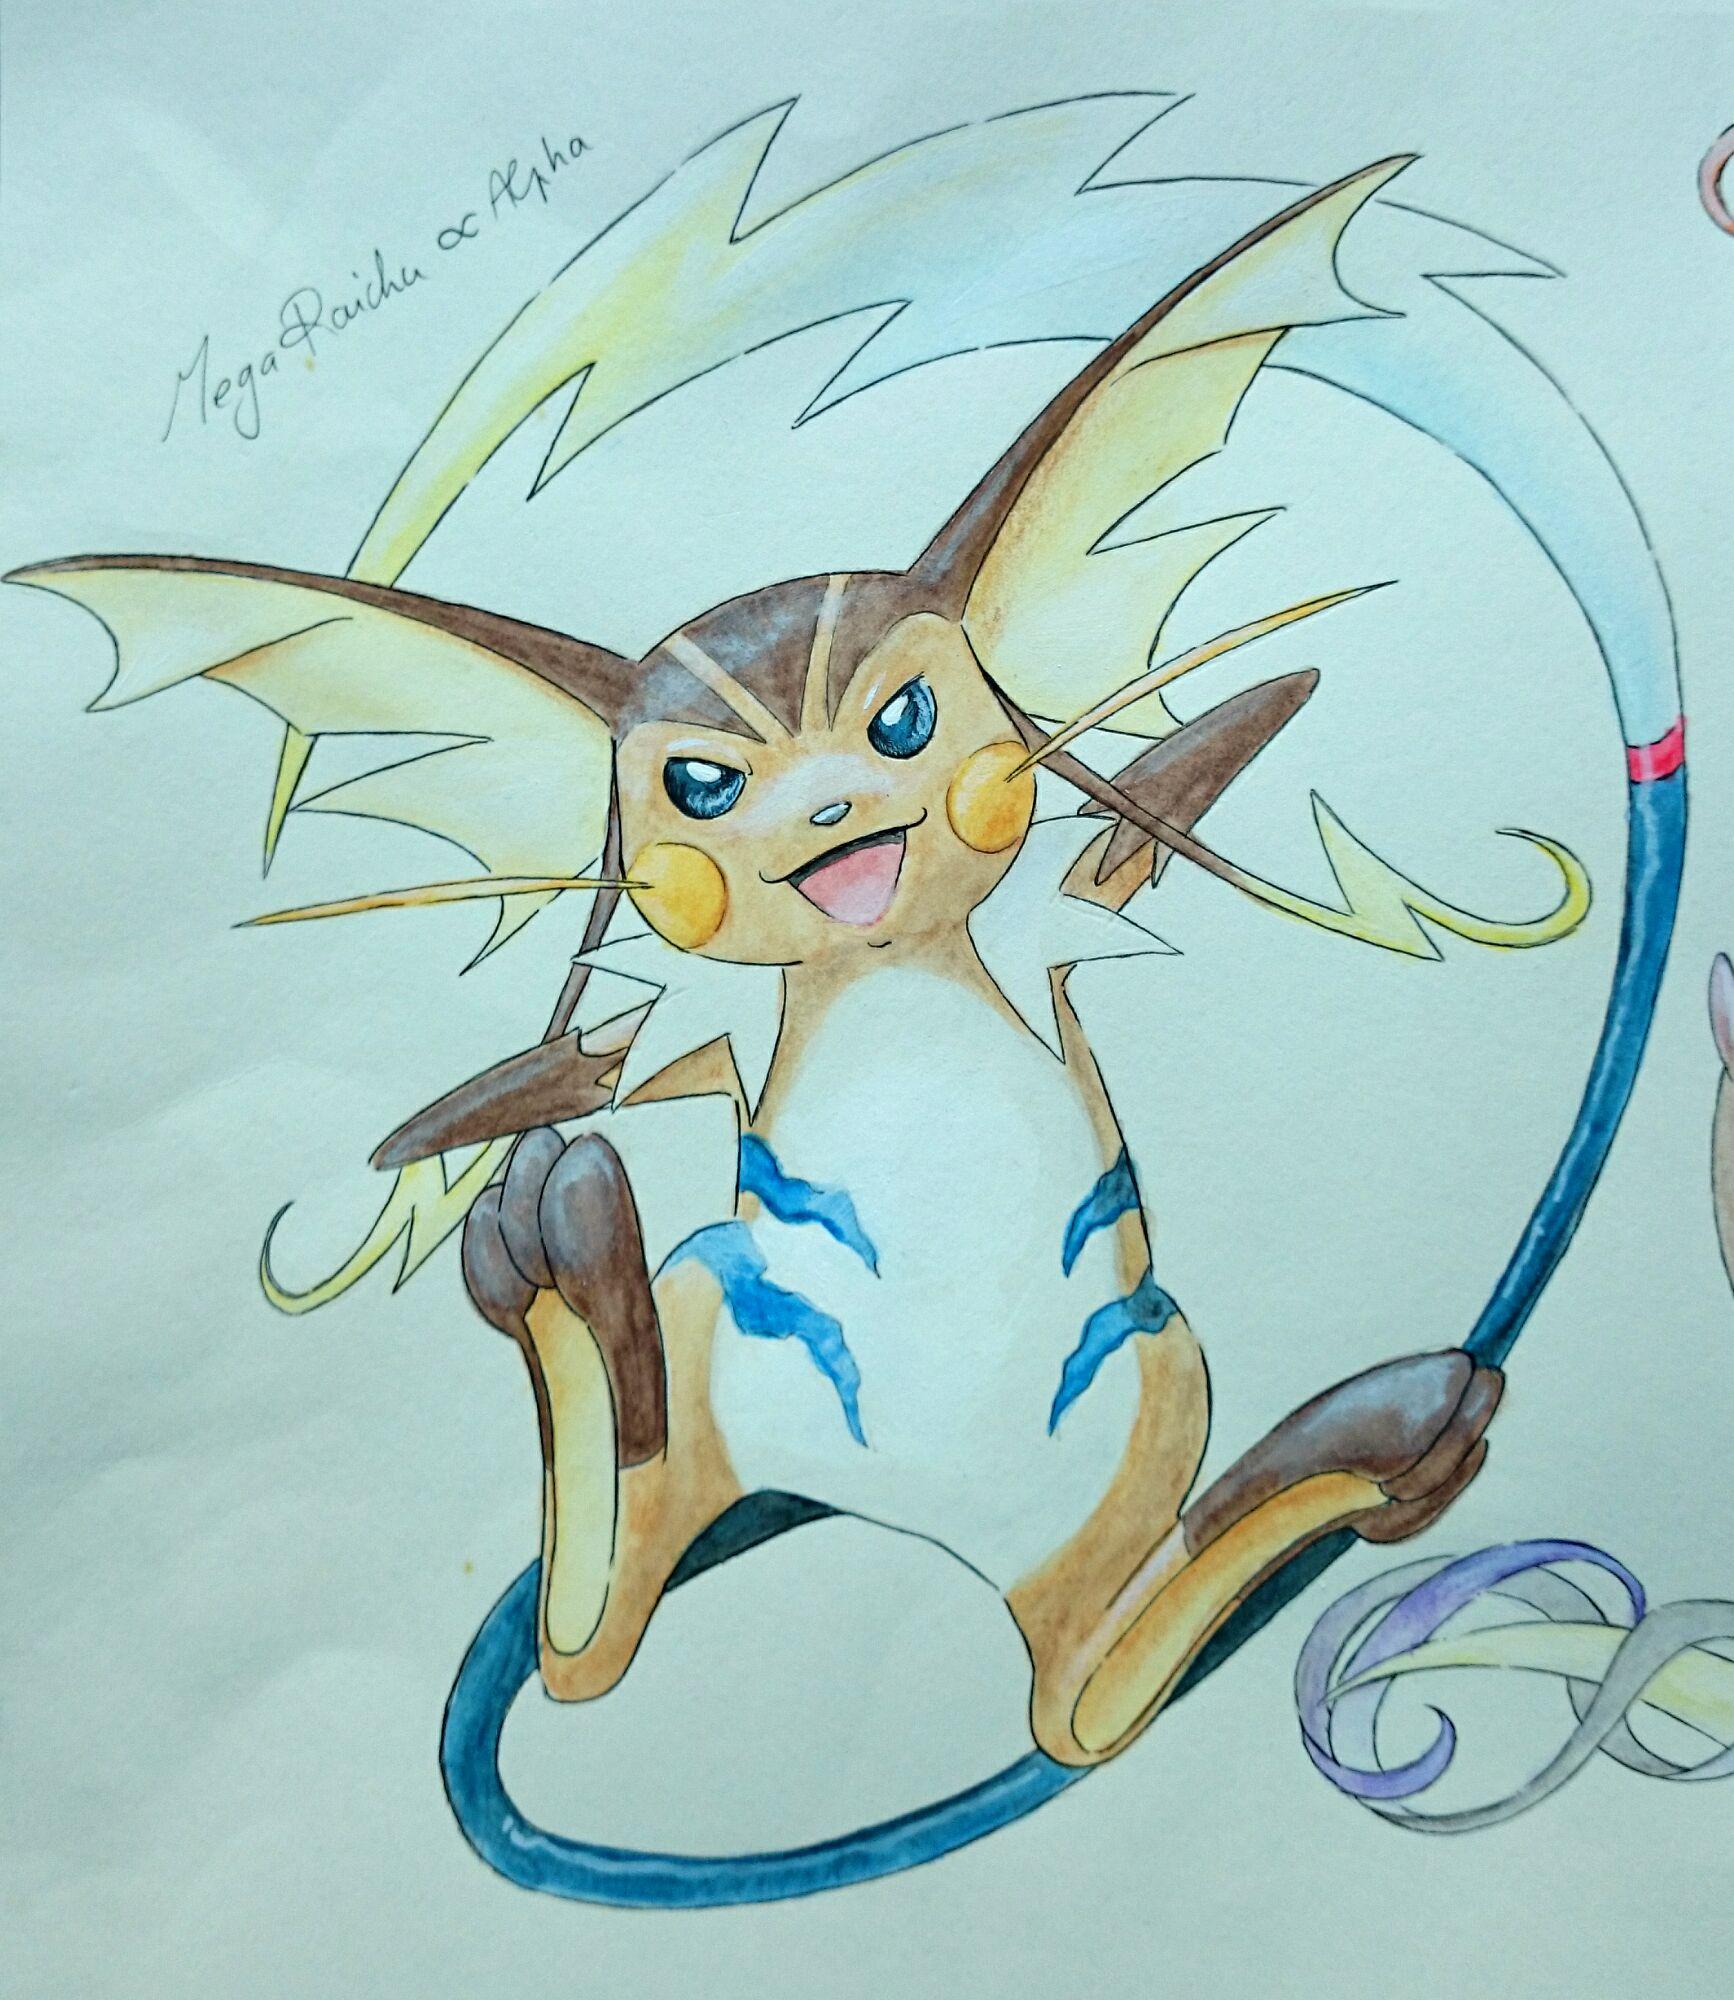 Pokémon-Zeichnung: Mega Raichu Alpha